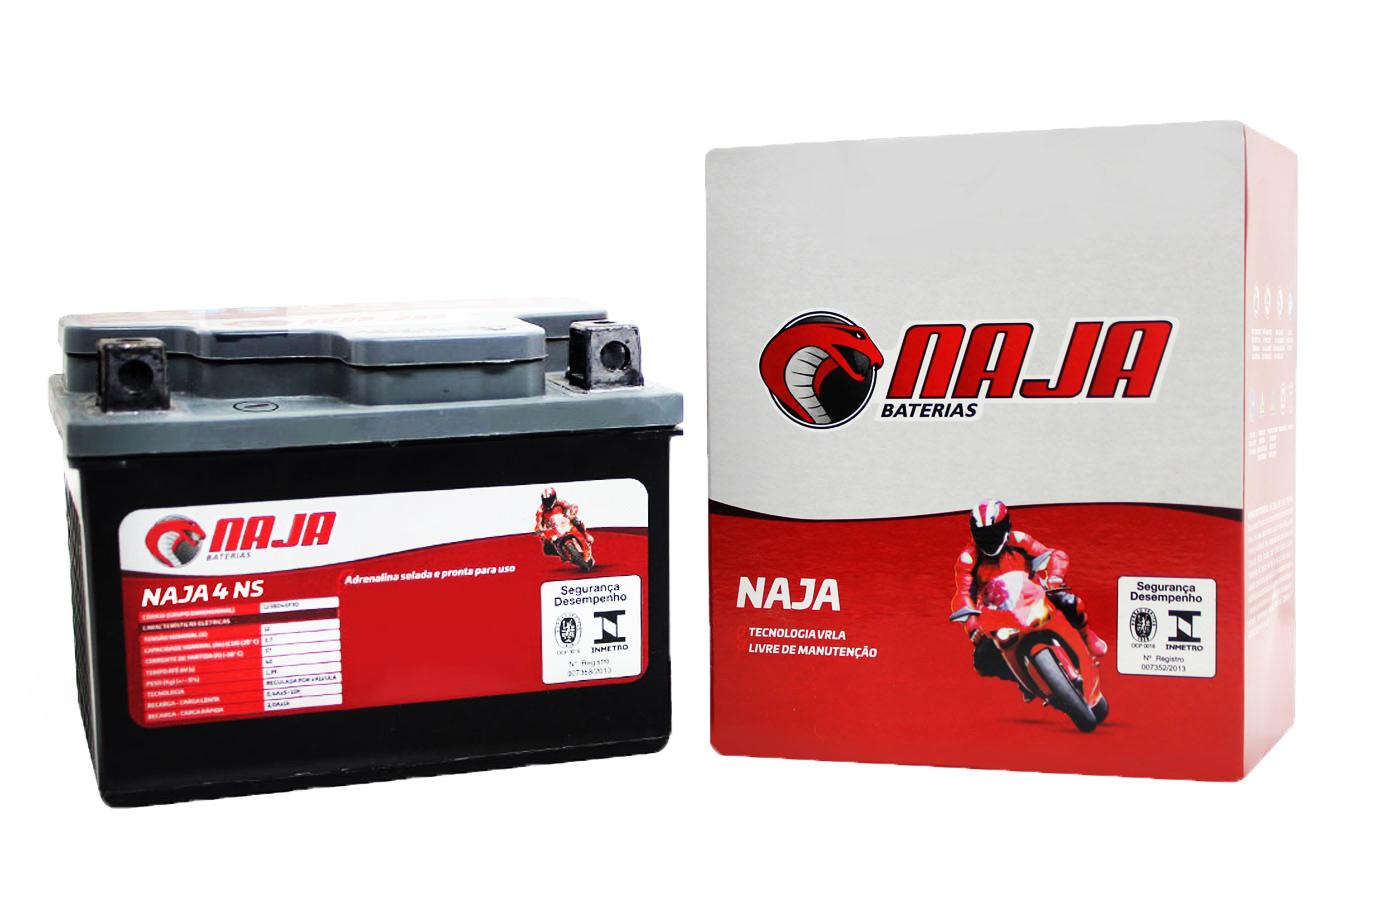 BATERIA KTM EXC 400 1999 A 2002 NAJA 4NS (YTX4L-BS)